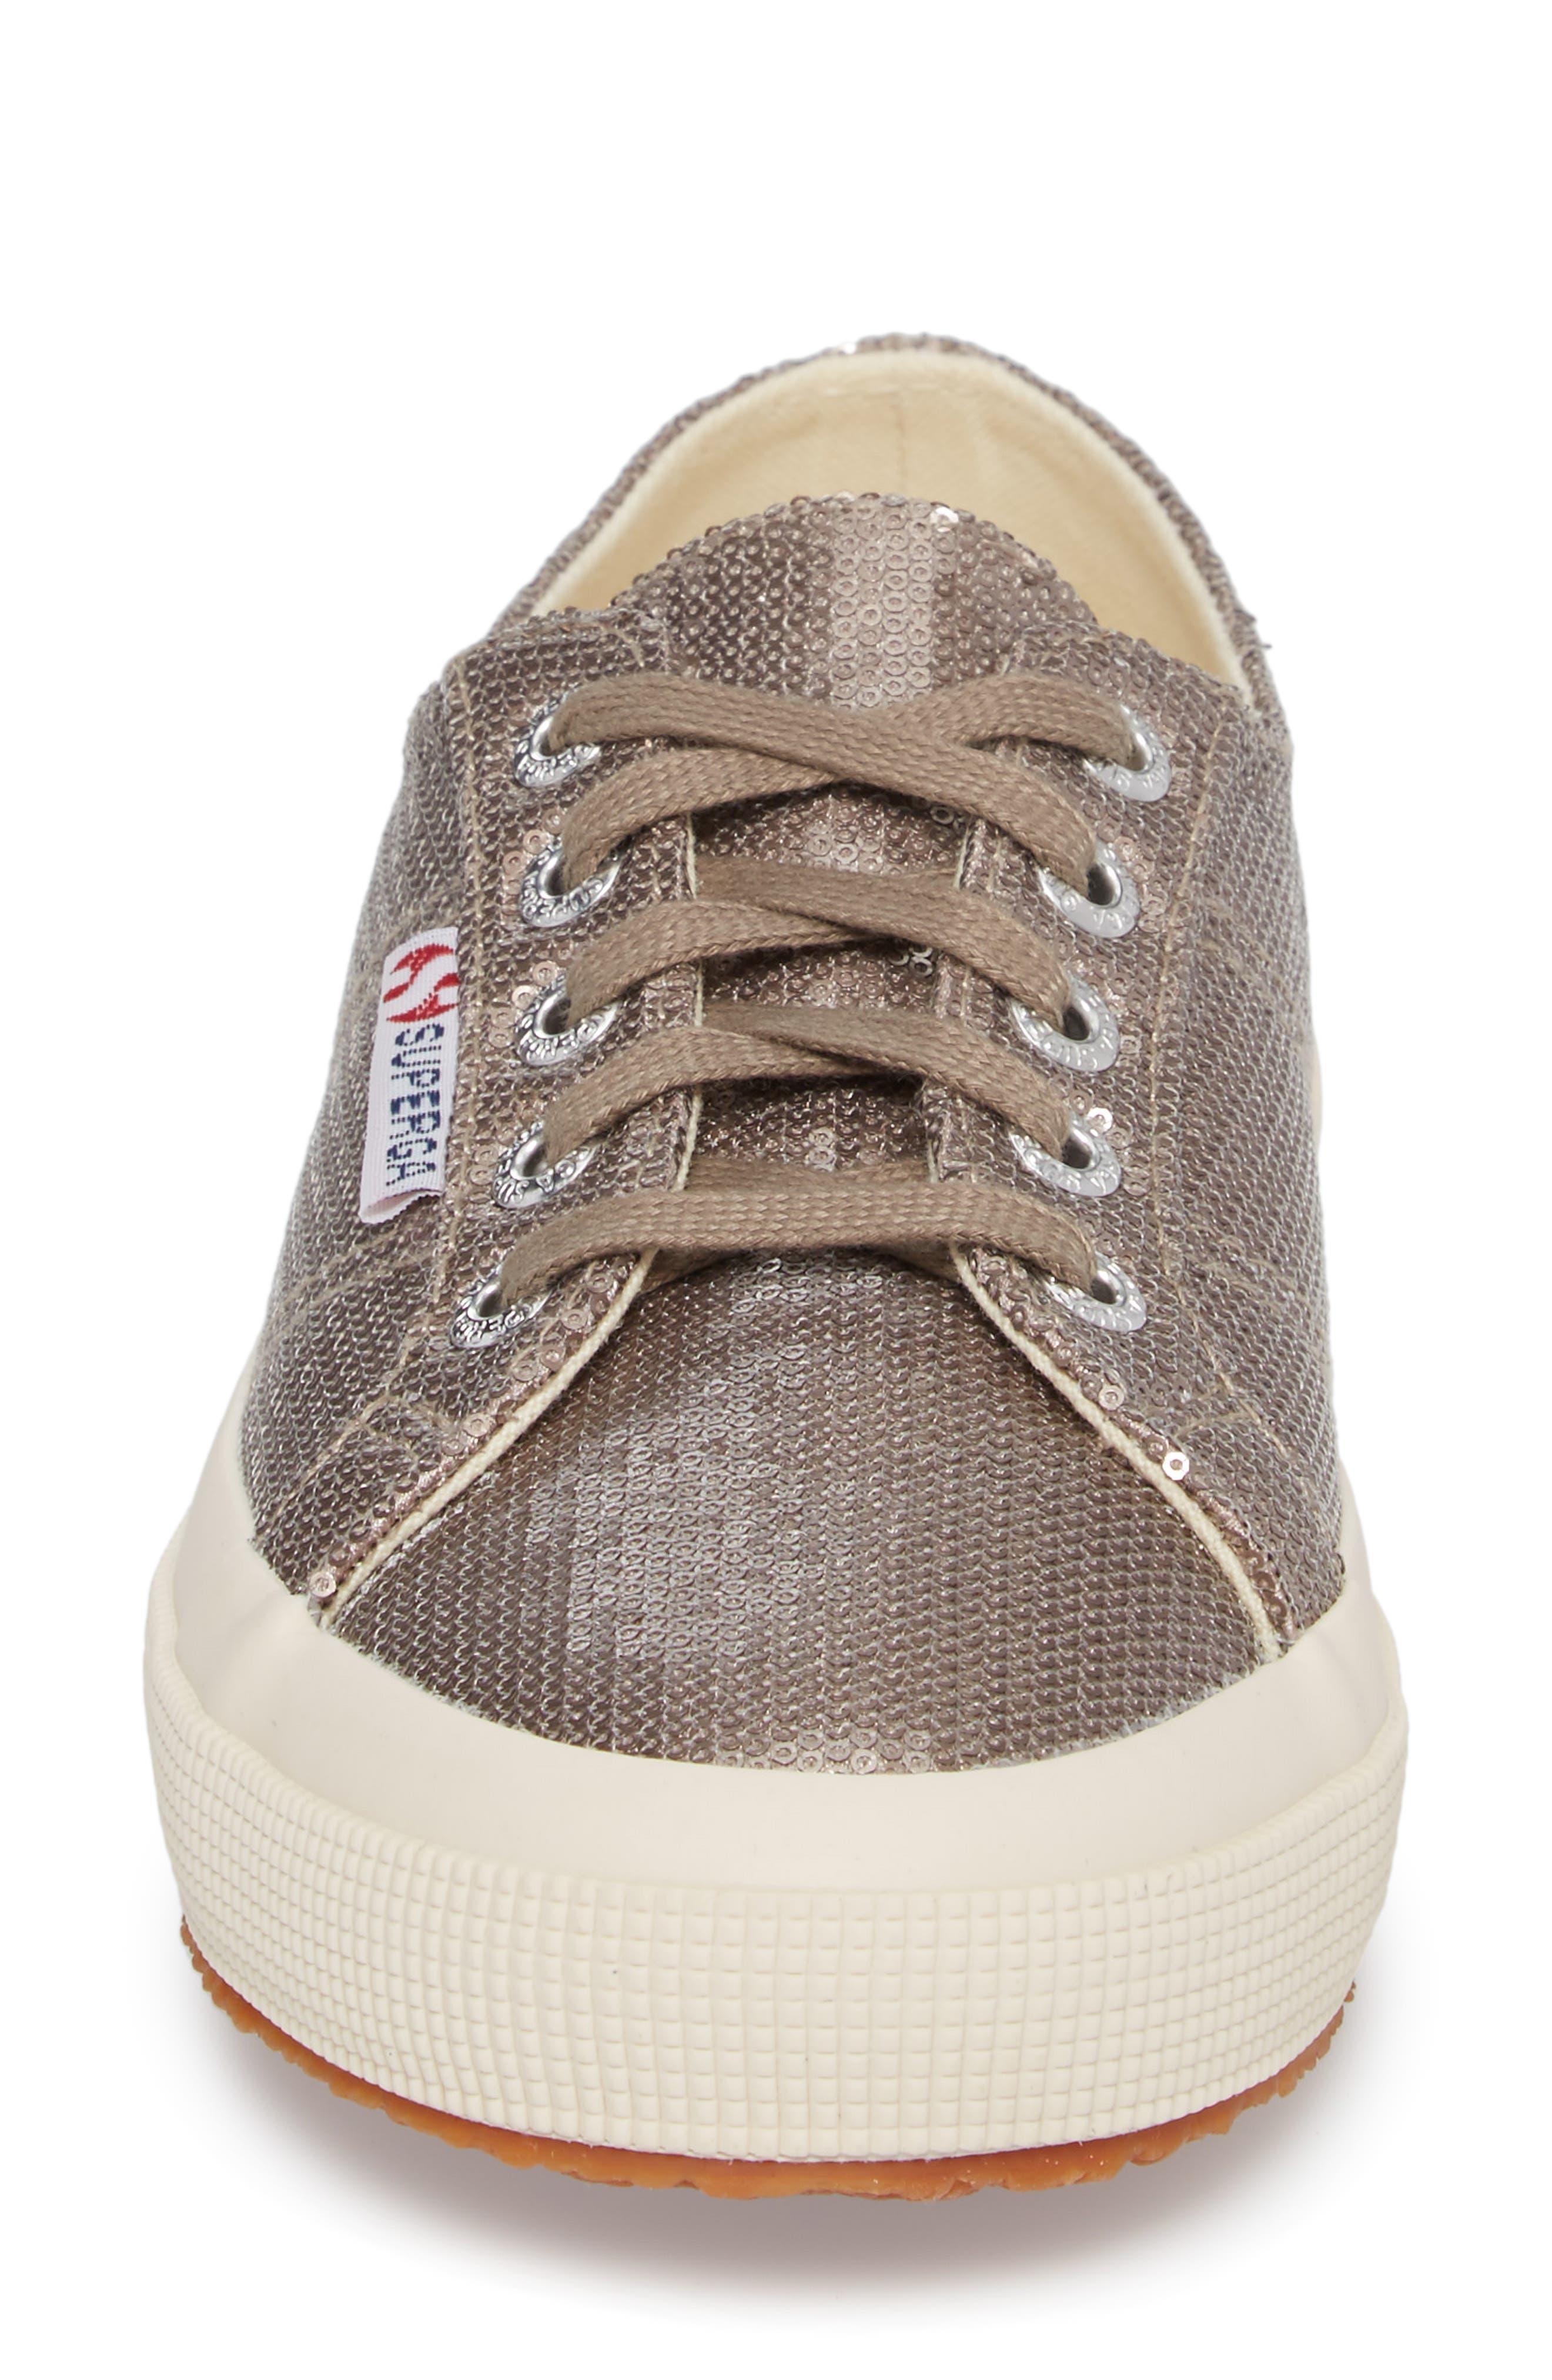 2750 Micro Sequin Sneaker,                             Alternate thumbnail 4, color,                             Bronze